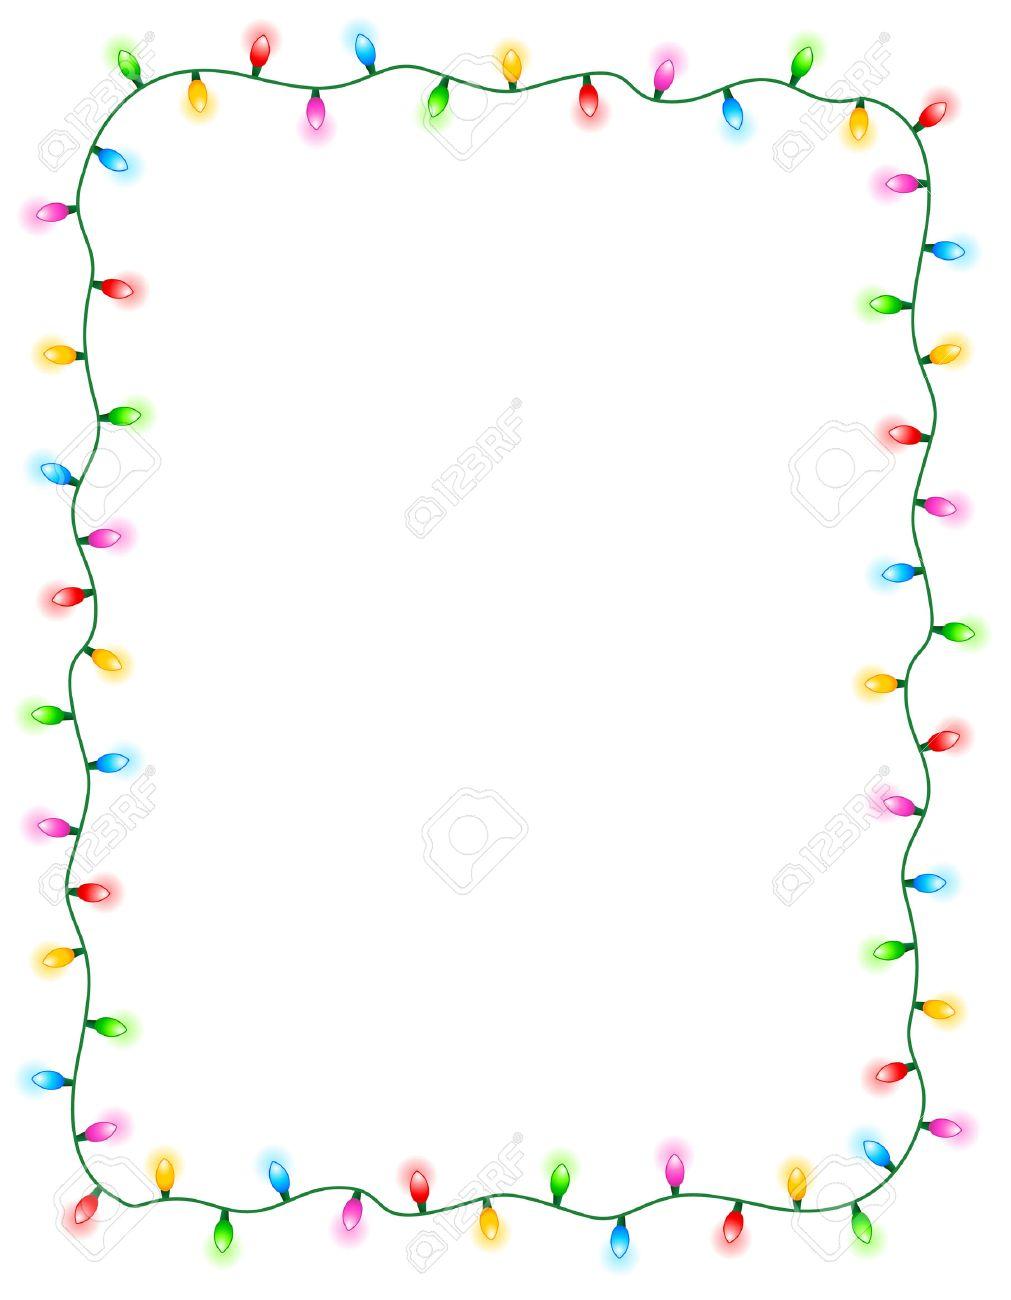 Christmas Light Border.Colorful Glowing Christmas Lights Border Frame Colorful Holiday